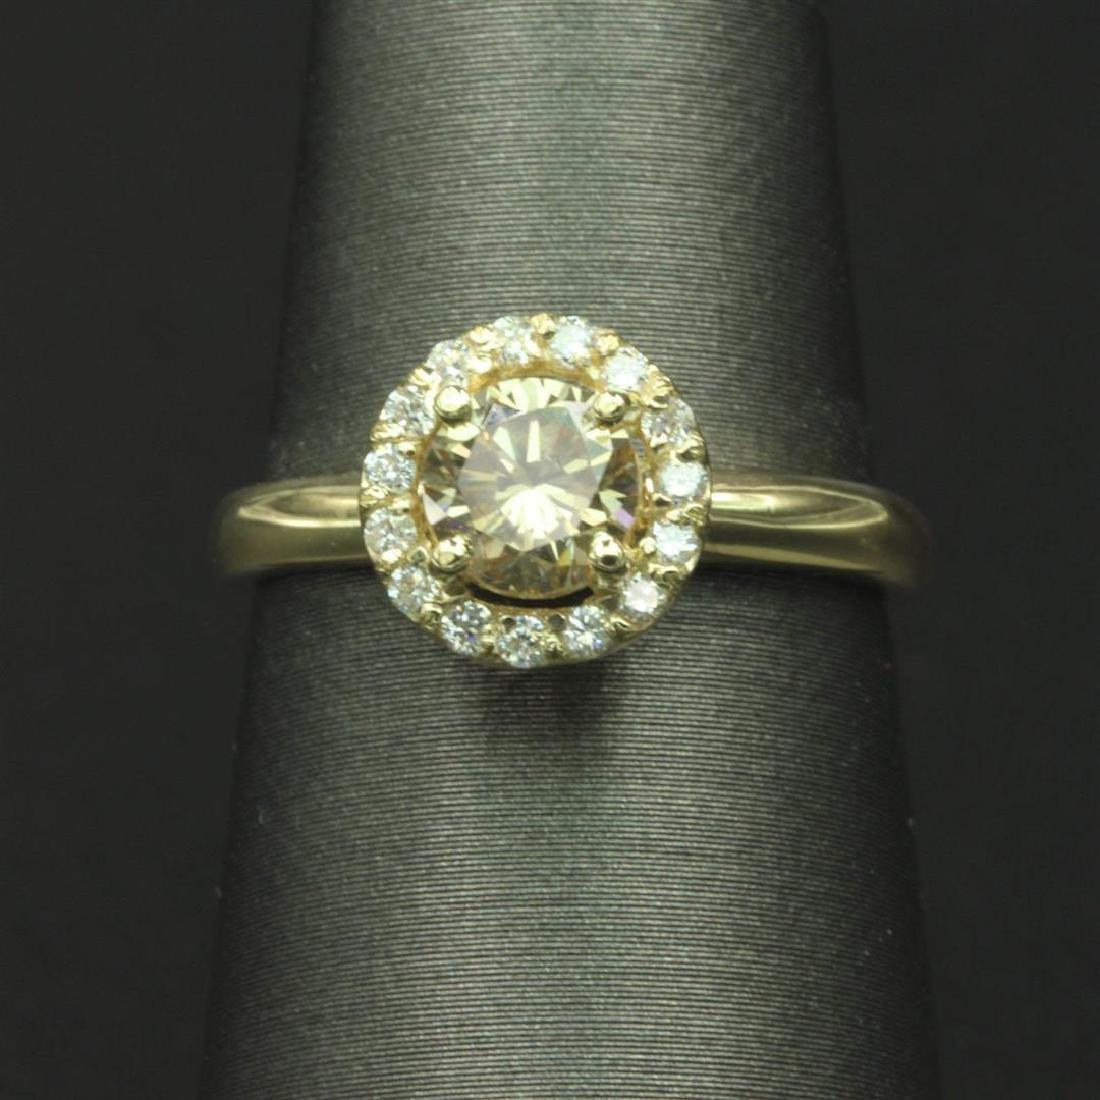 0.90 ctw Diamond Wedding Ring - 14KT Yellow Gold